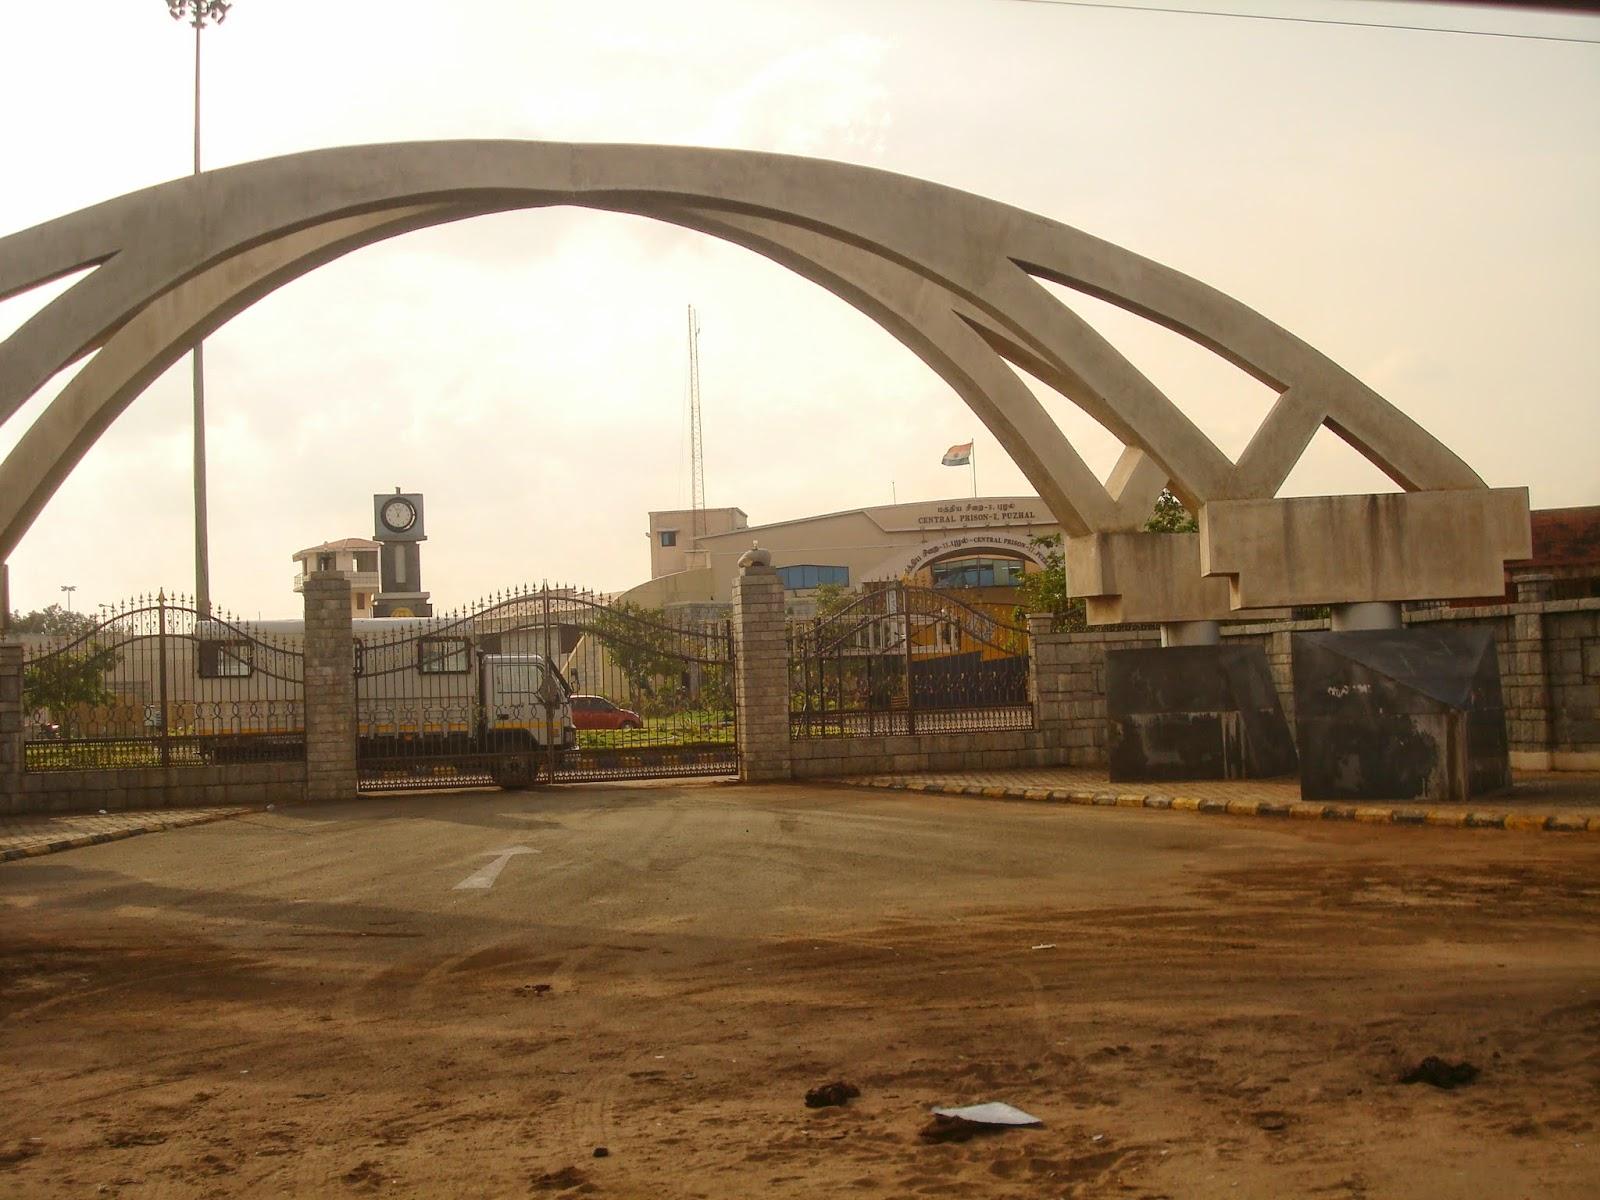 Chennai Daily Photo: Prison gate